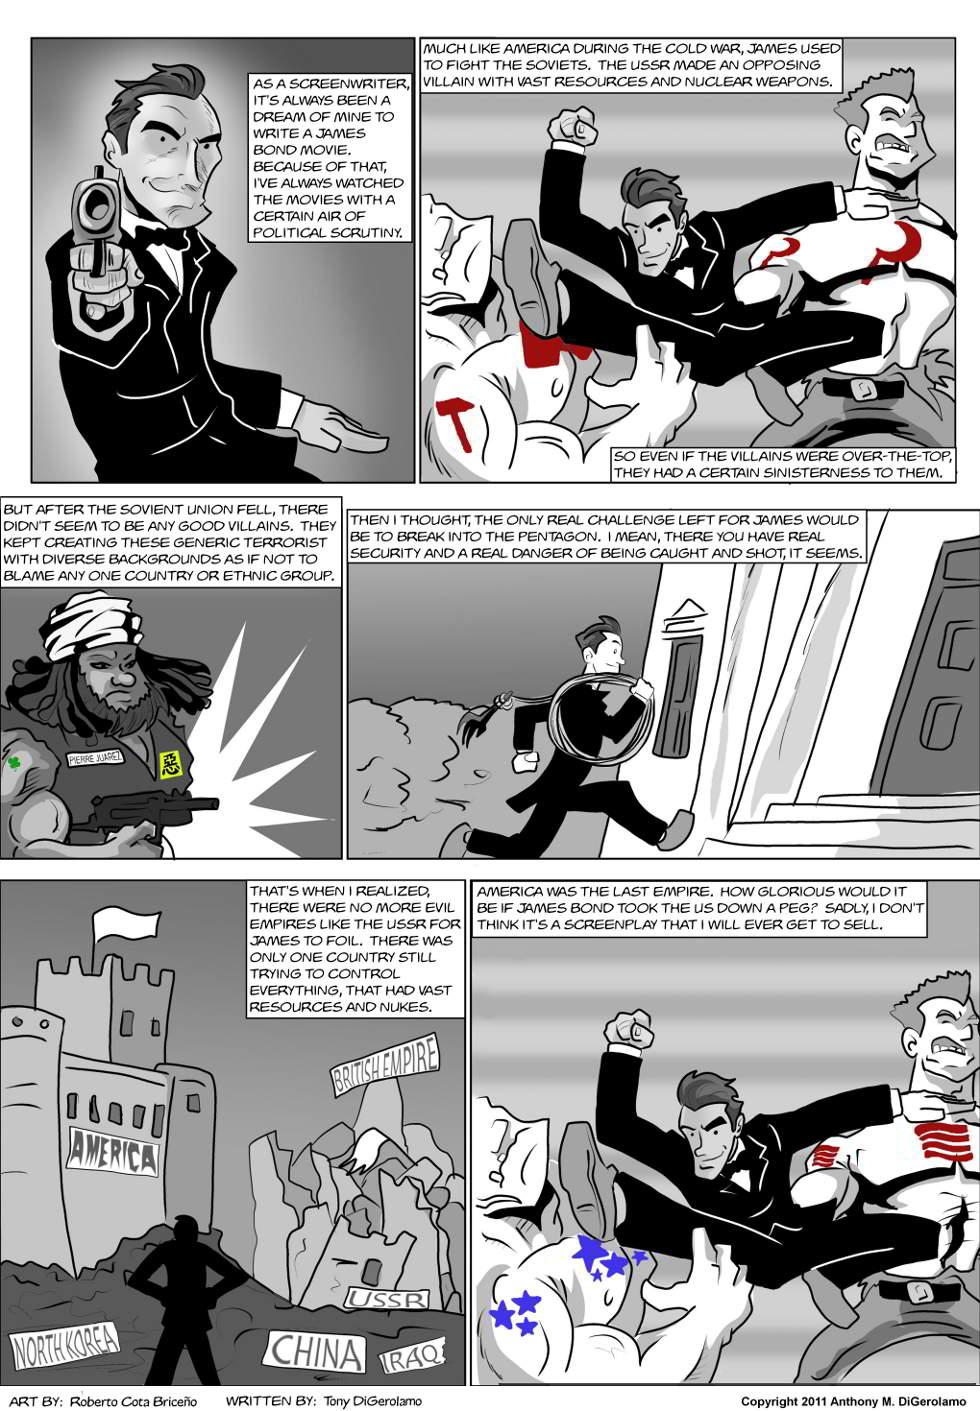 The Antiwar Comic:  If I Wrote James Bond